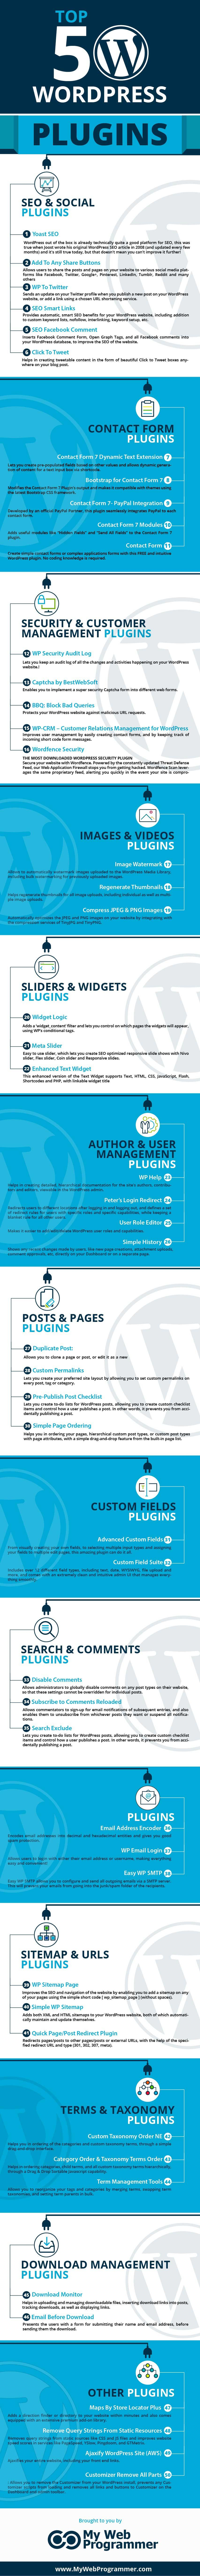 top-50-wordpress-plugins-infographic